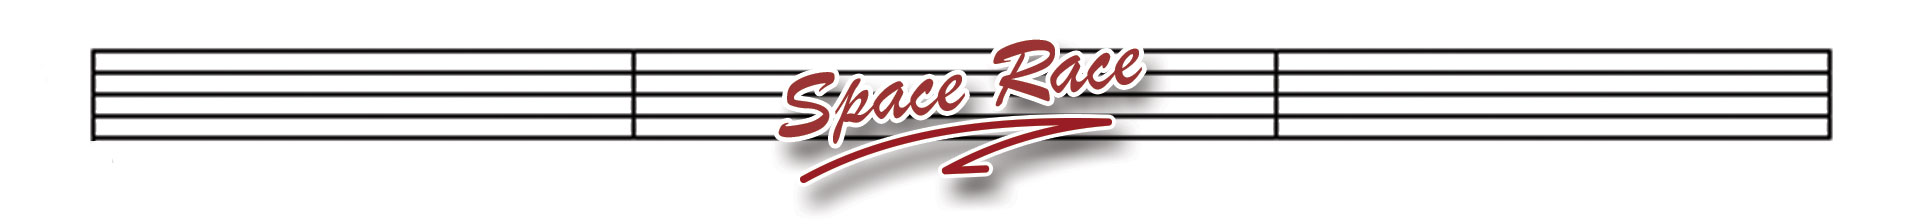 S.Race